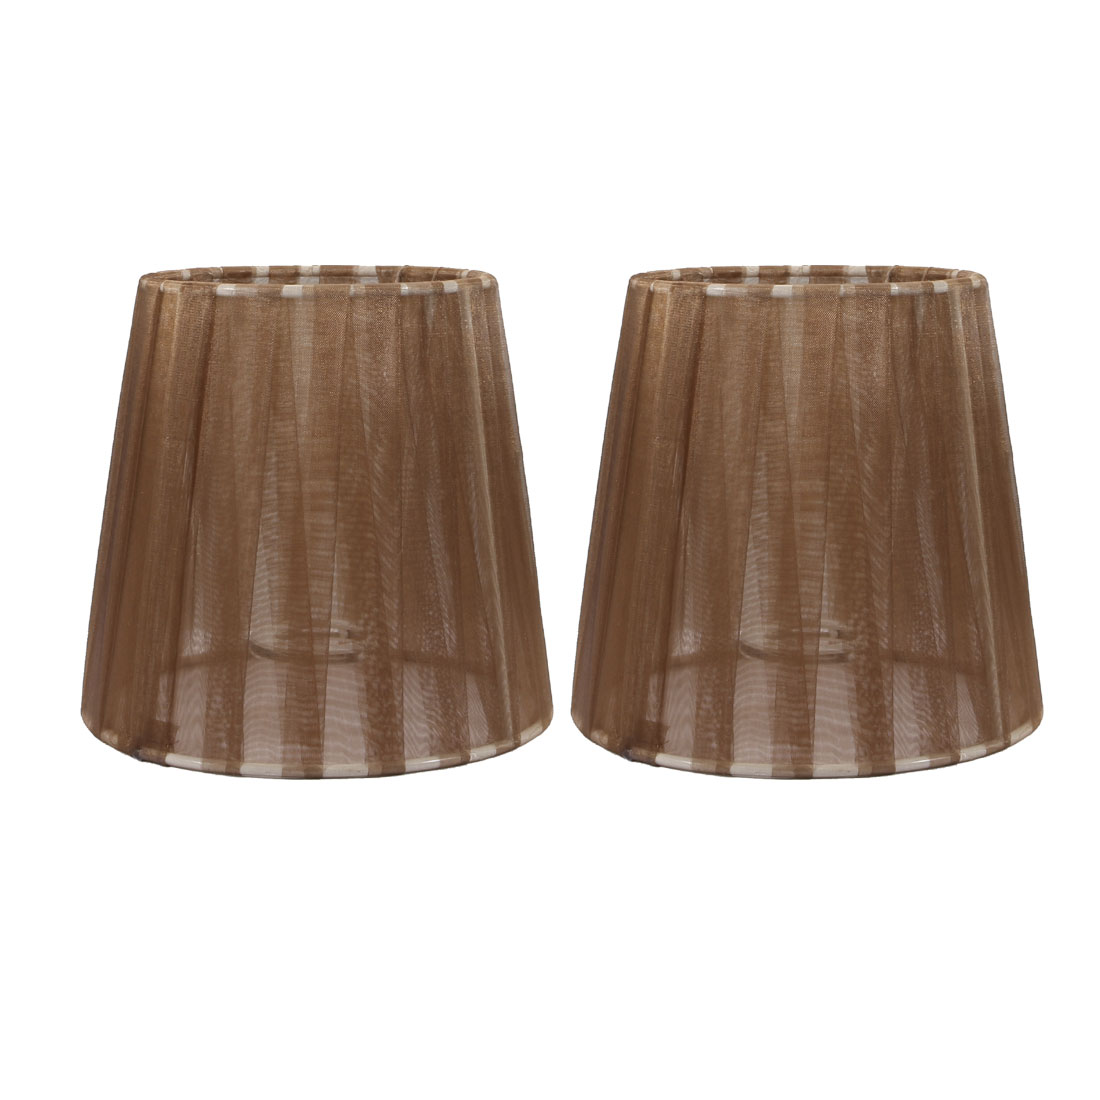 2pcs E14 Brown Wall Lamp Candle Pendant Light Bulb Lamp Cover Lamp Shade